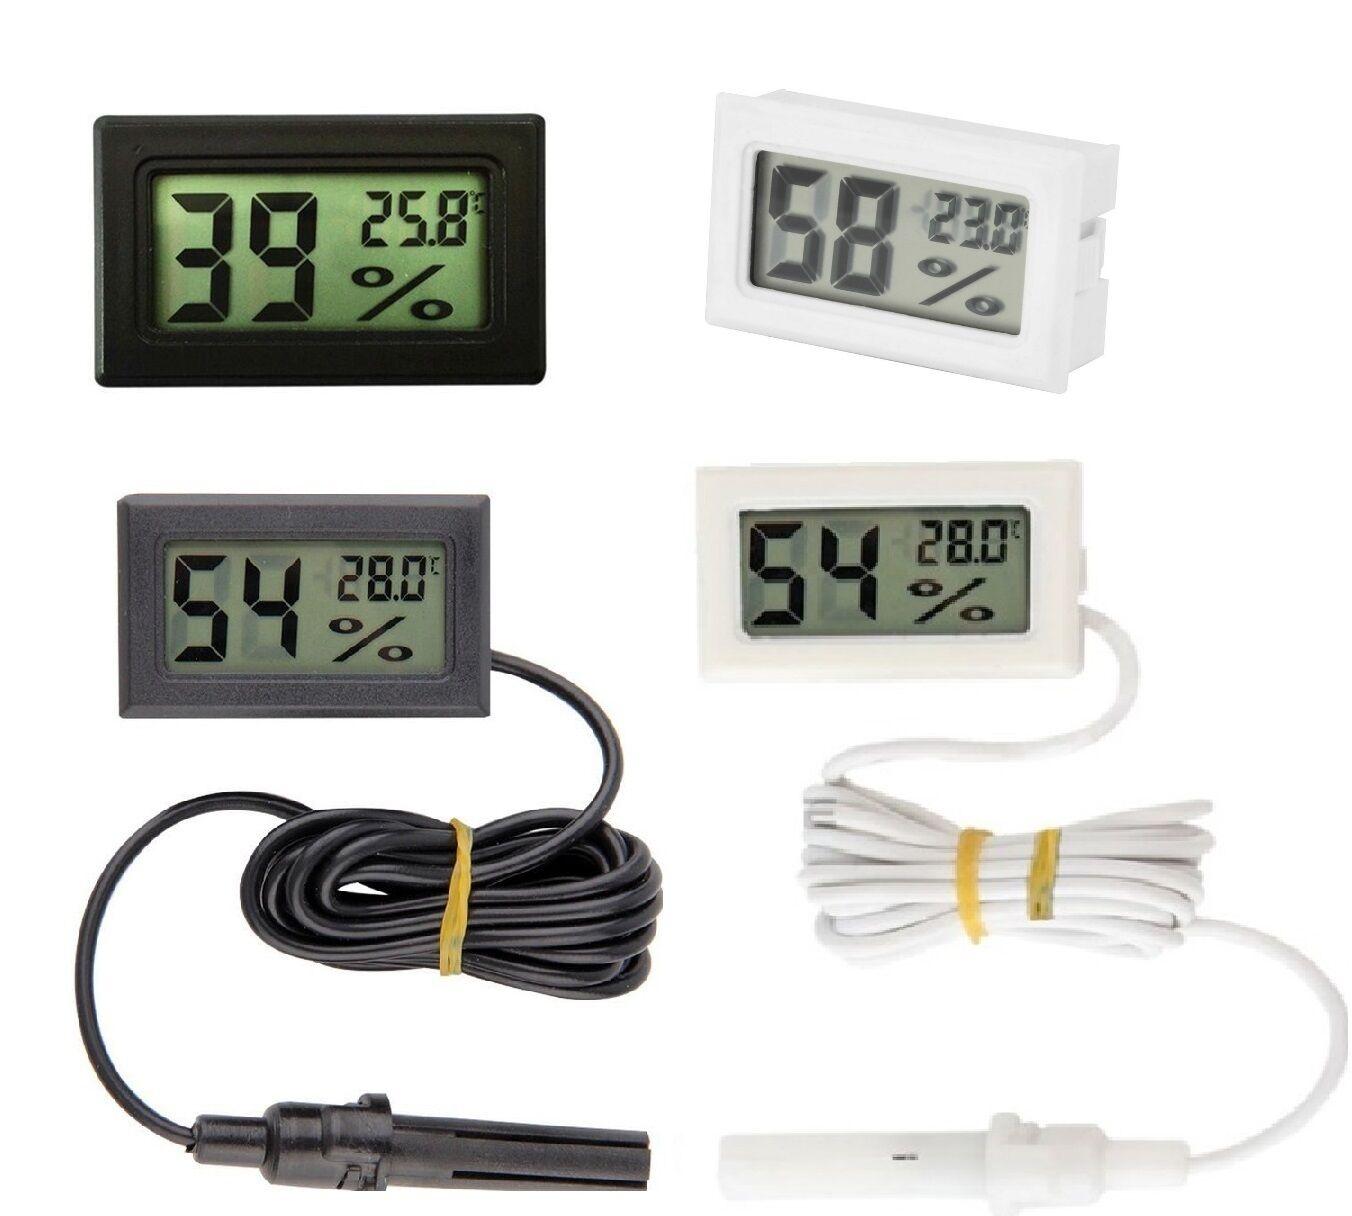 Digital LCD Indoor Temperature Humidity Meter Thermometer Hygrometer K9